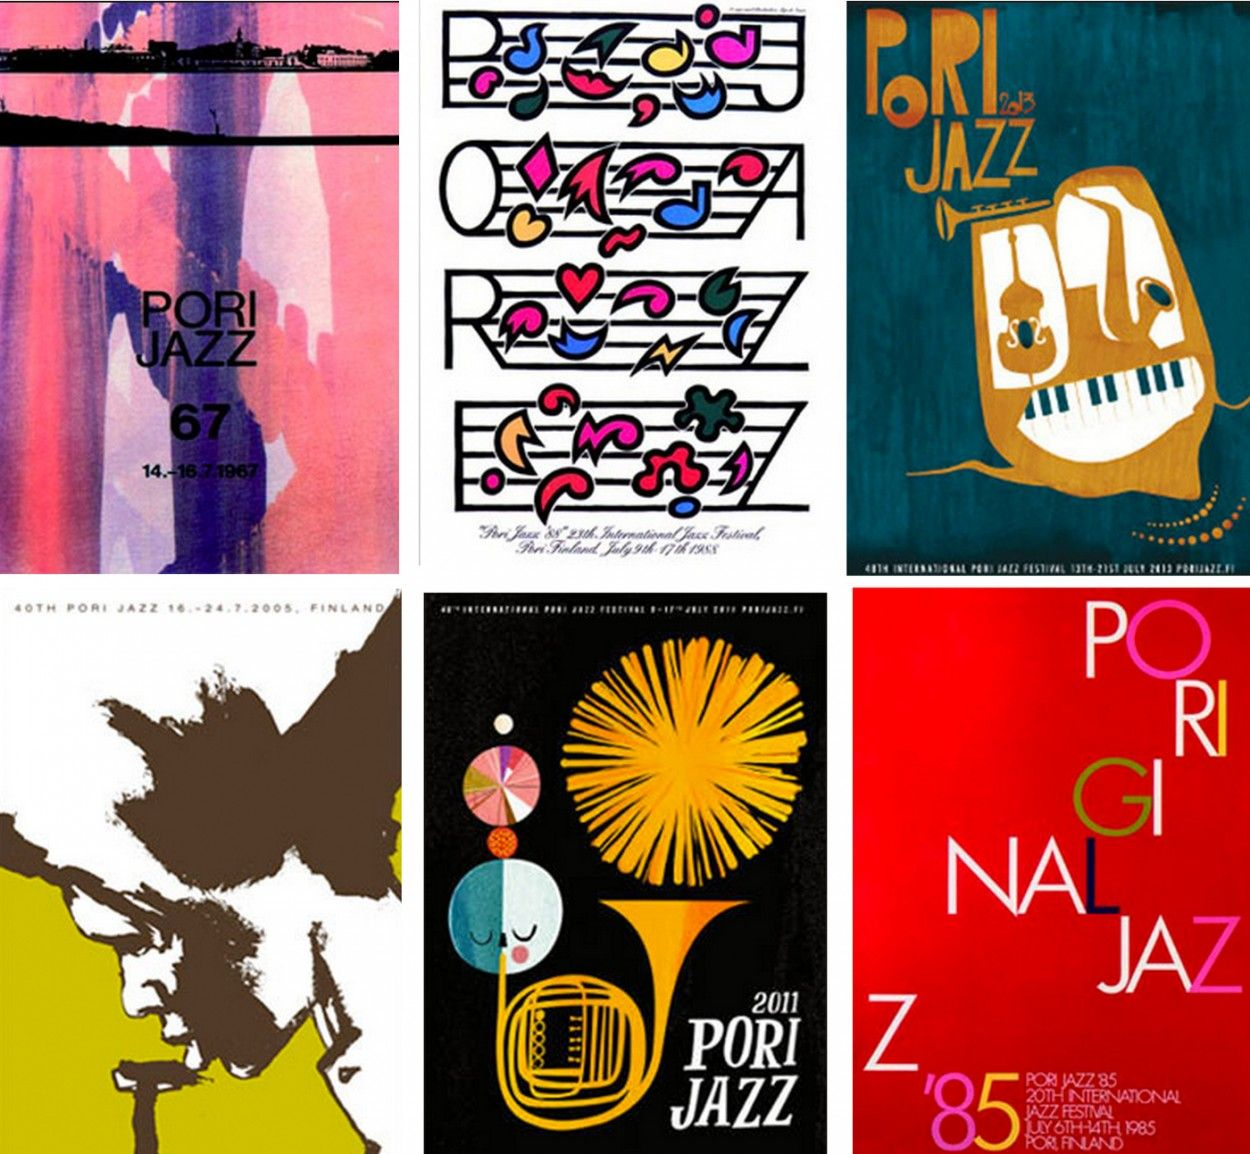 pori-jazz-julisteet1.jpg